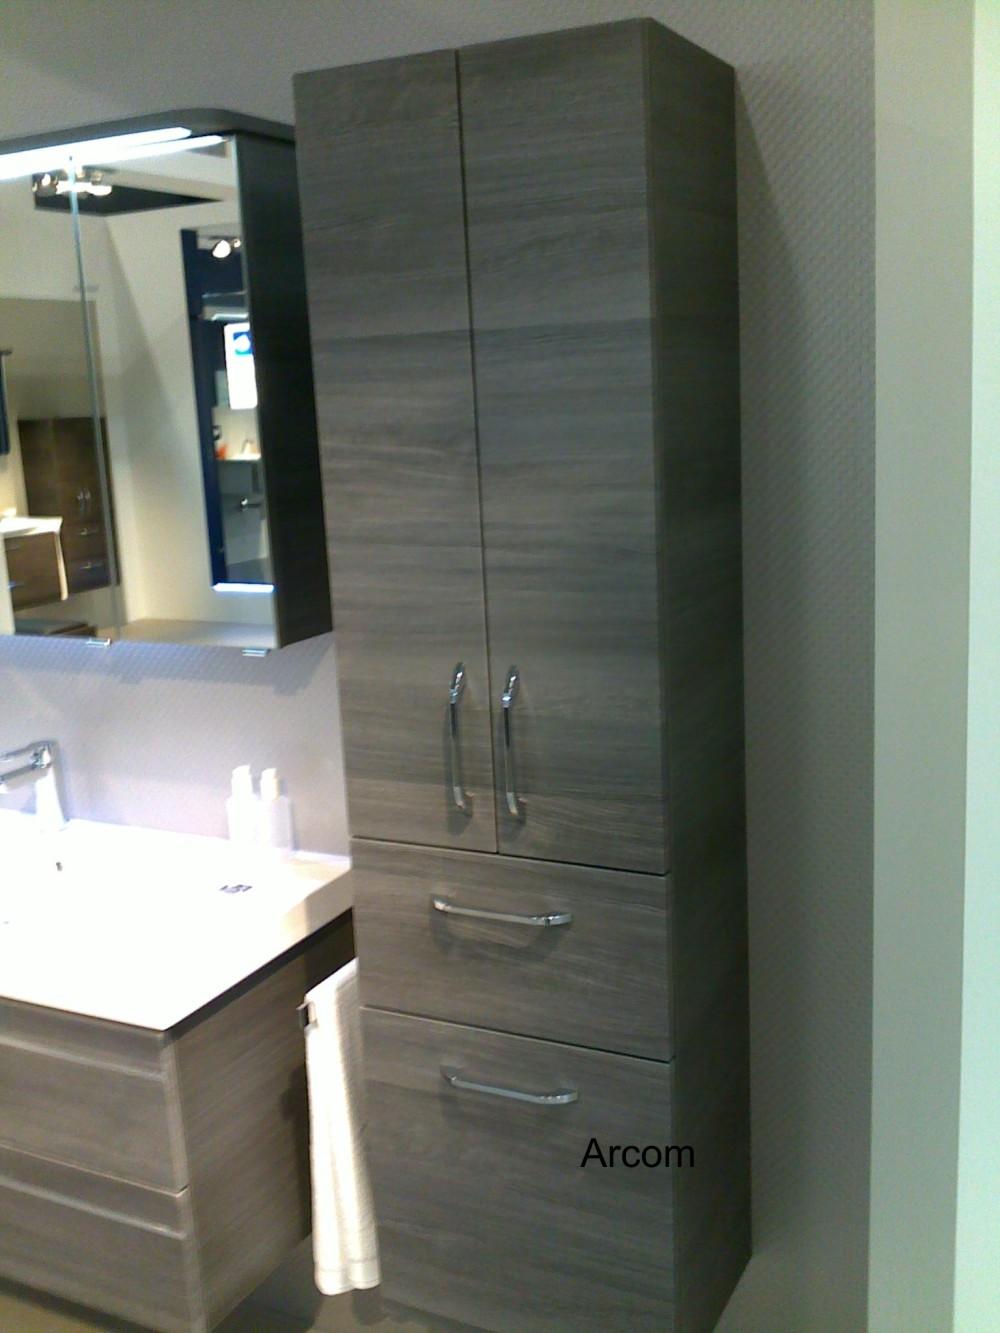 hochschrank balto badschrank g nstig arcom center. Black Bedroom Furniture Sets. Home Design Ideas